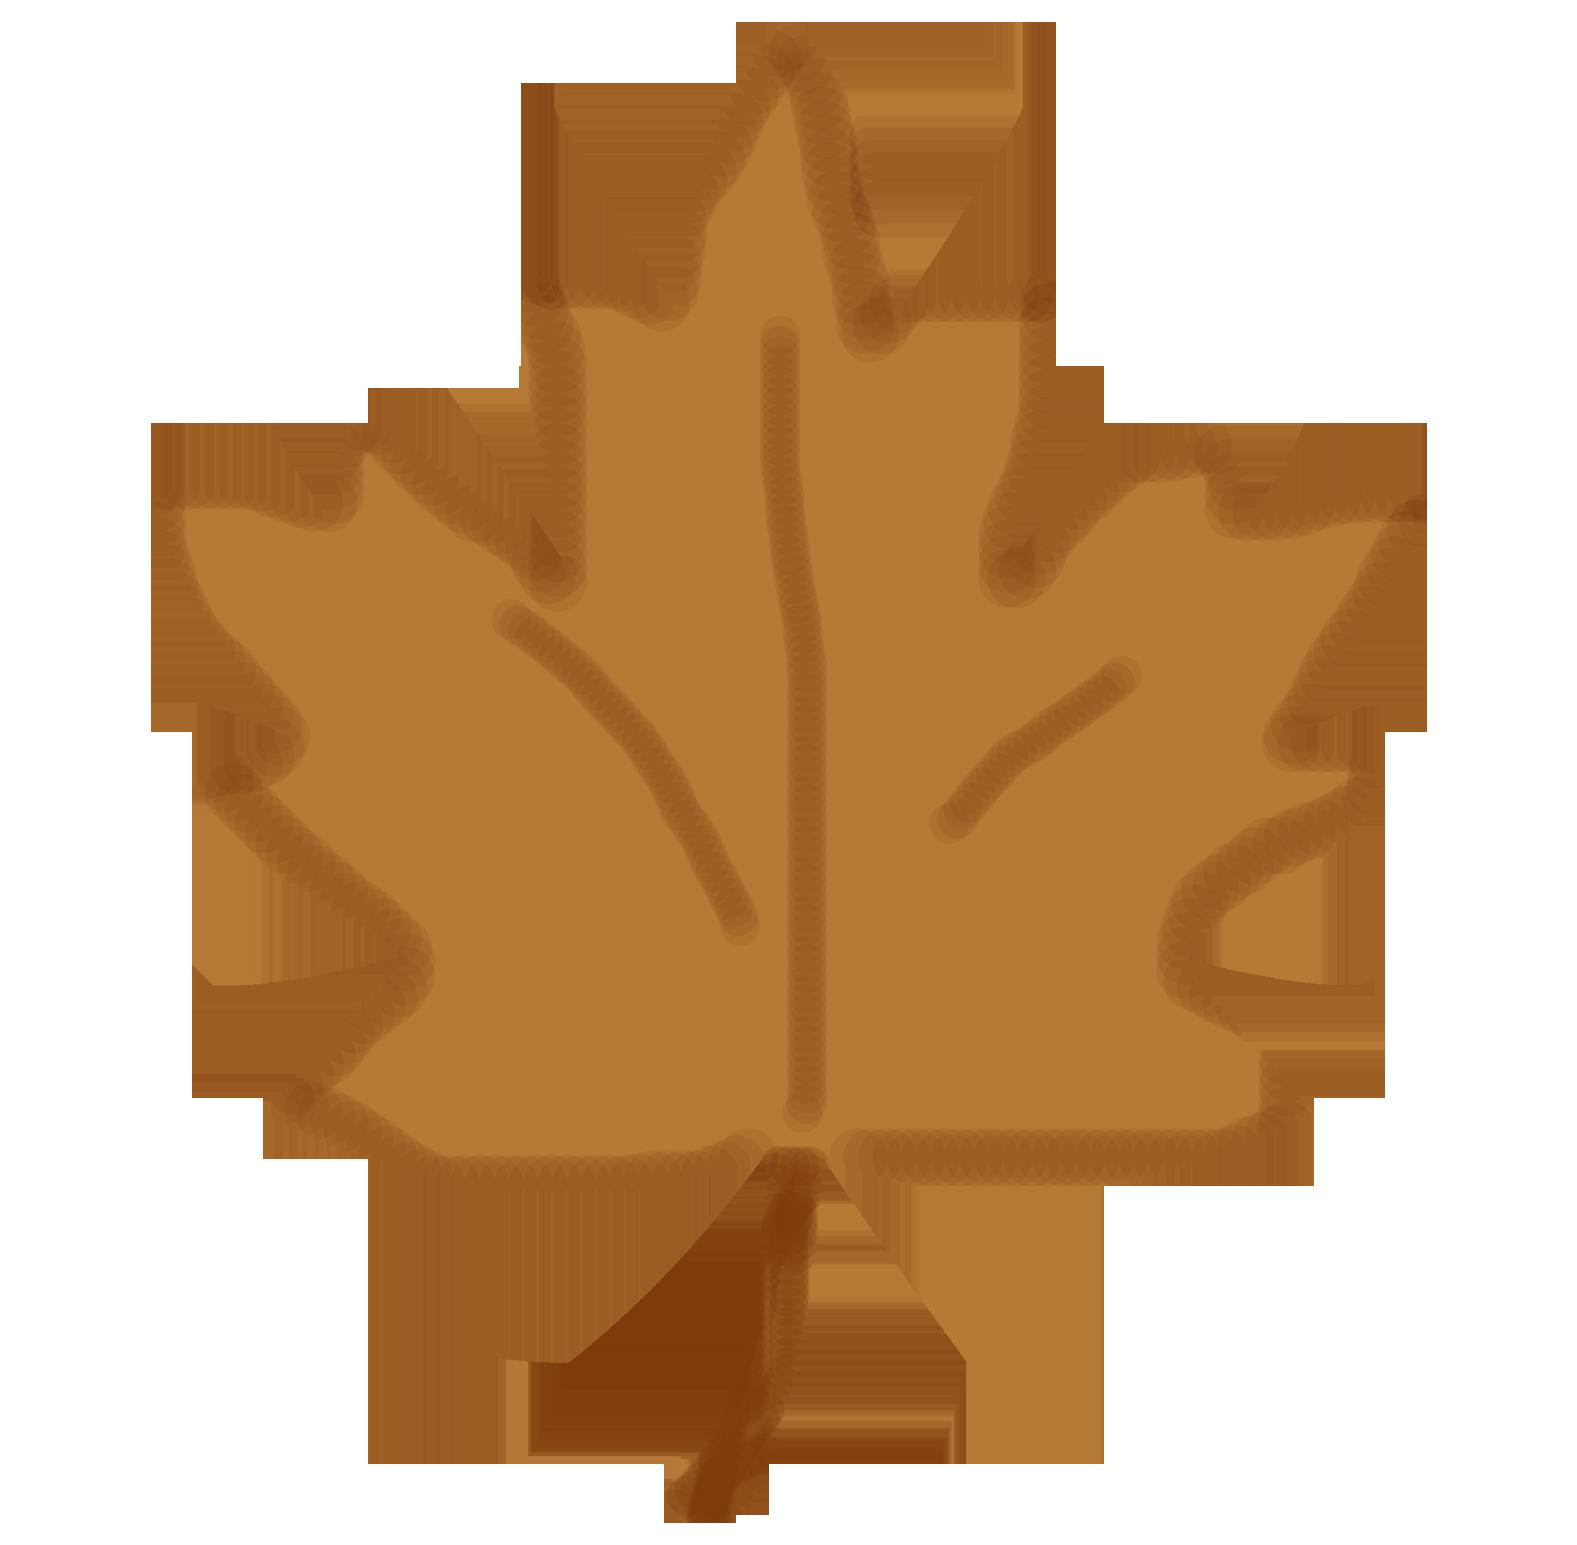 leaf pattern clipart - photo #30